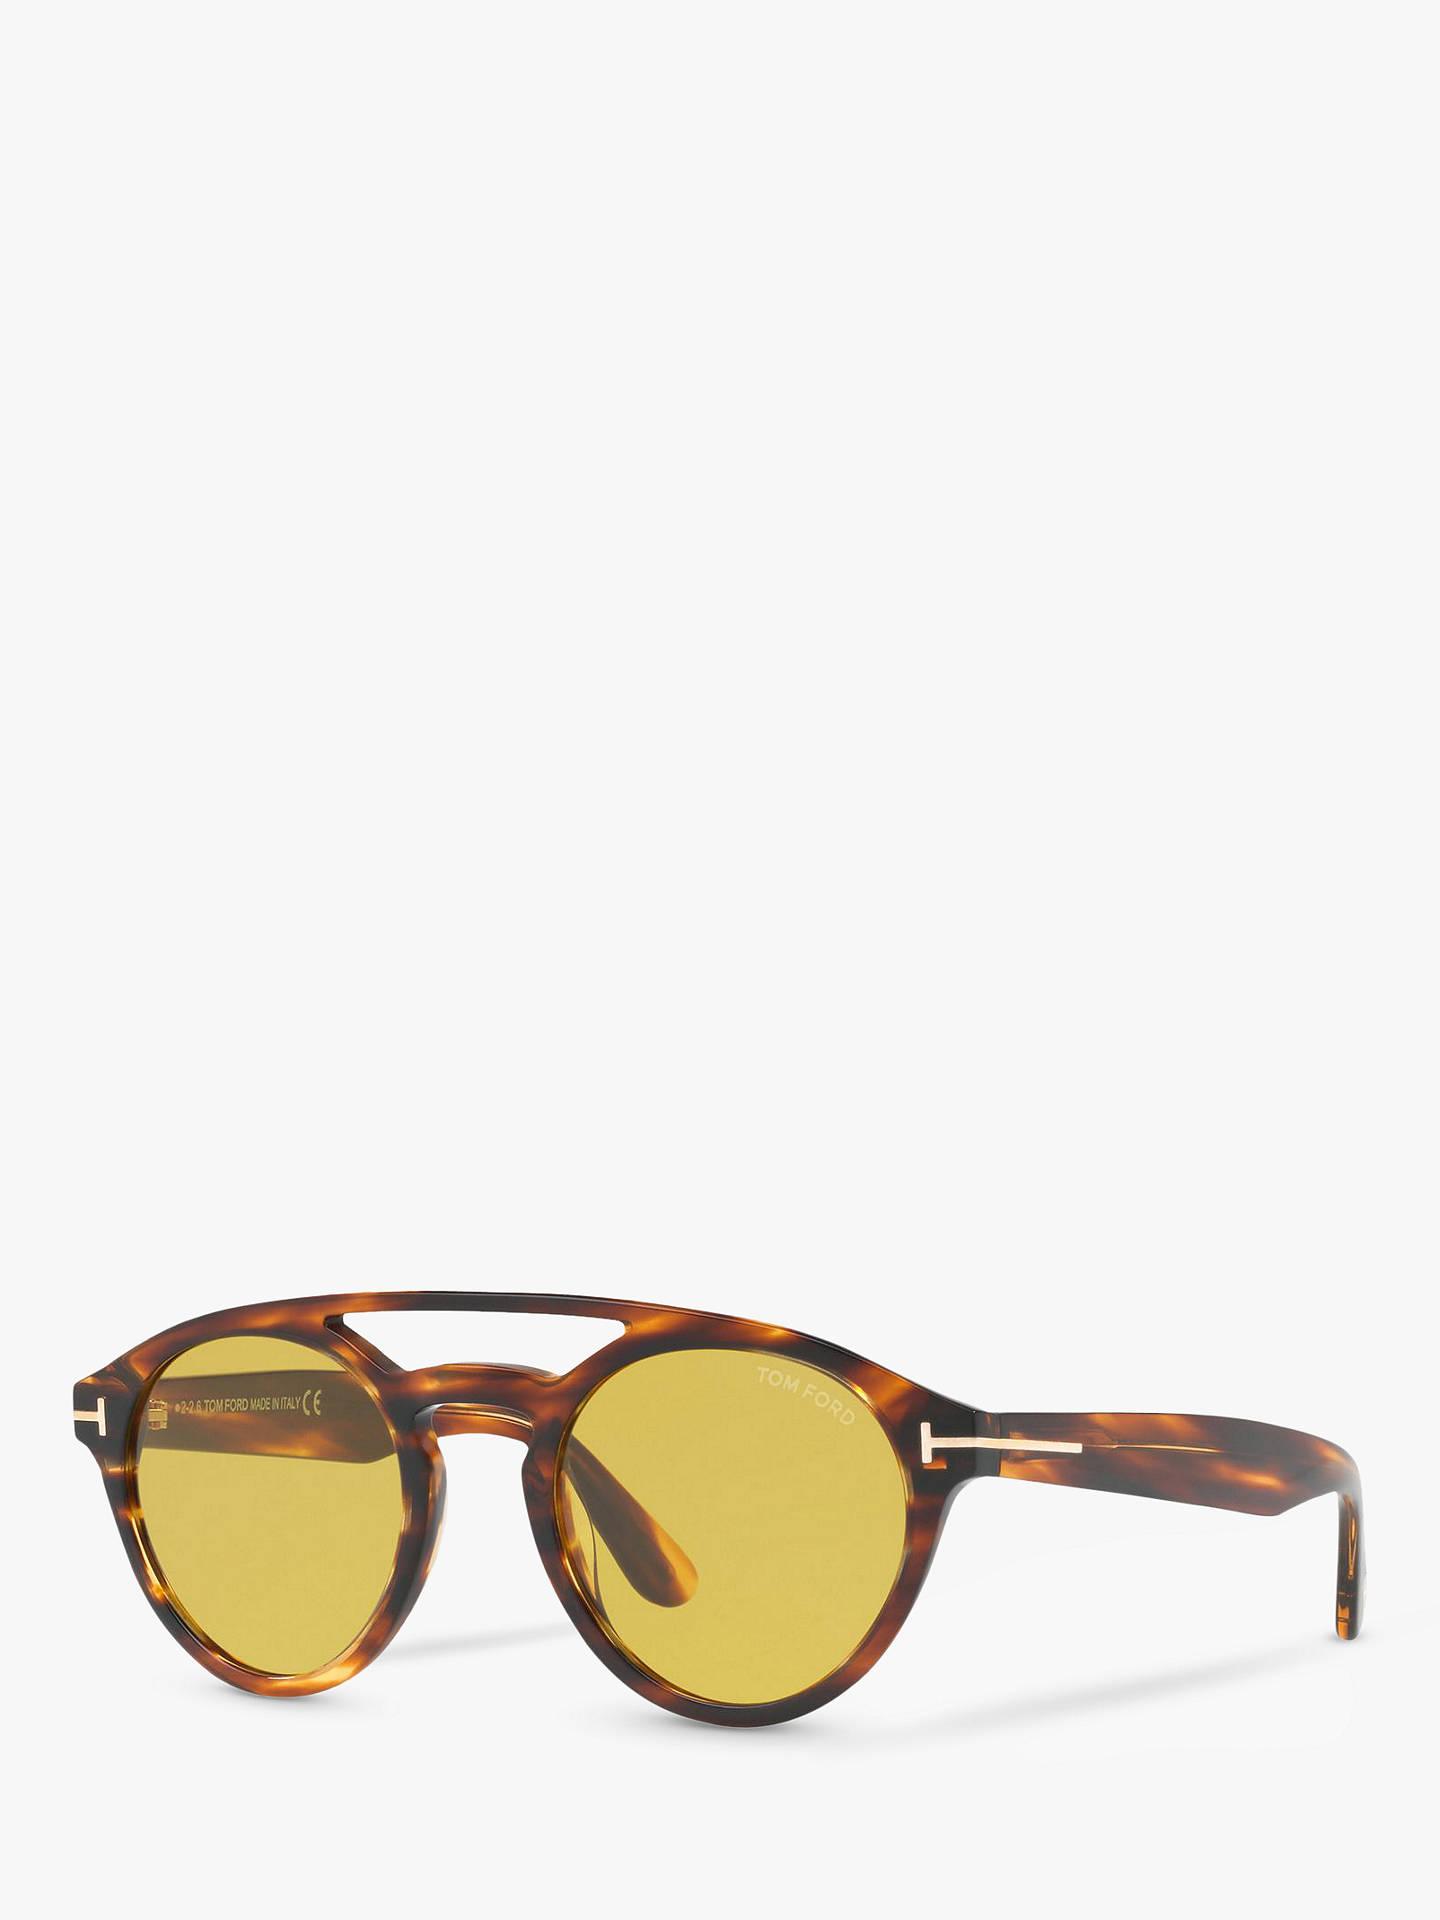 908d9f0e046d Buy TOM FORD FT0537 Clint Round Sunglasses